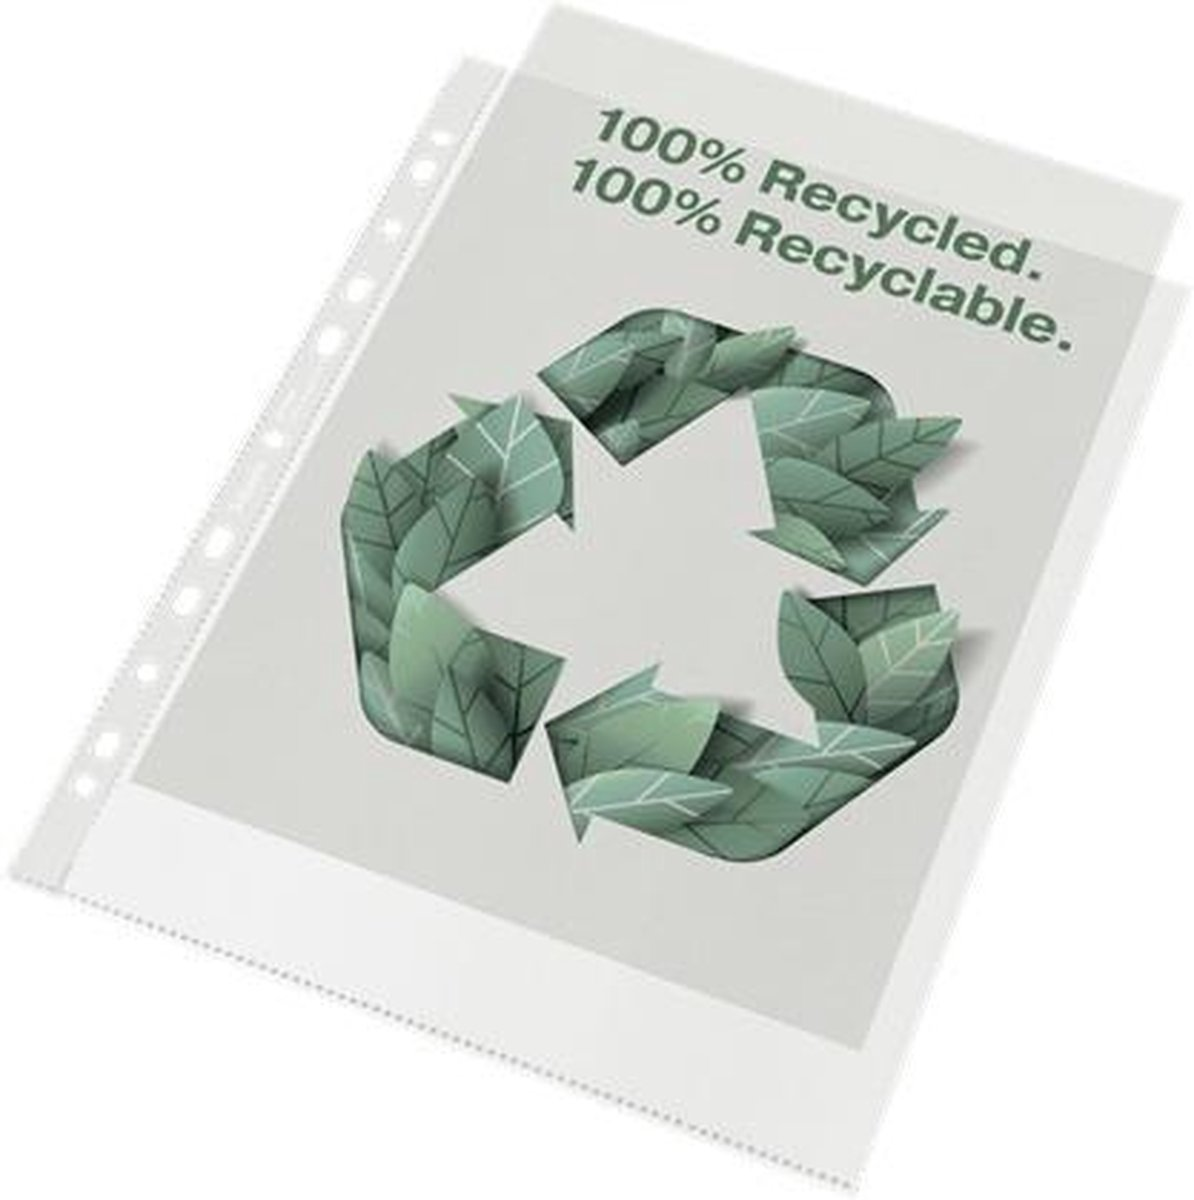 Esselte 100% Gerecyclede PP A4 Maxi Showtas - 70 micron - 100x Transparante, Milieuvriendelijke Insteekhoezen - Duurzaamheid